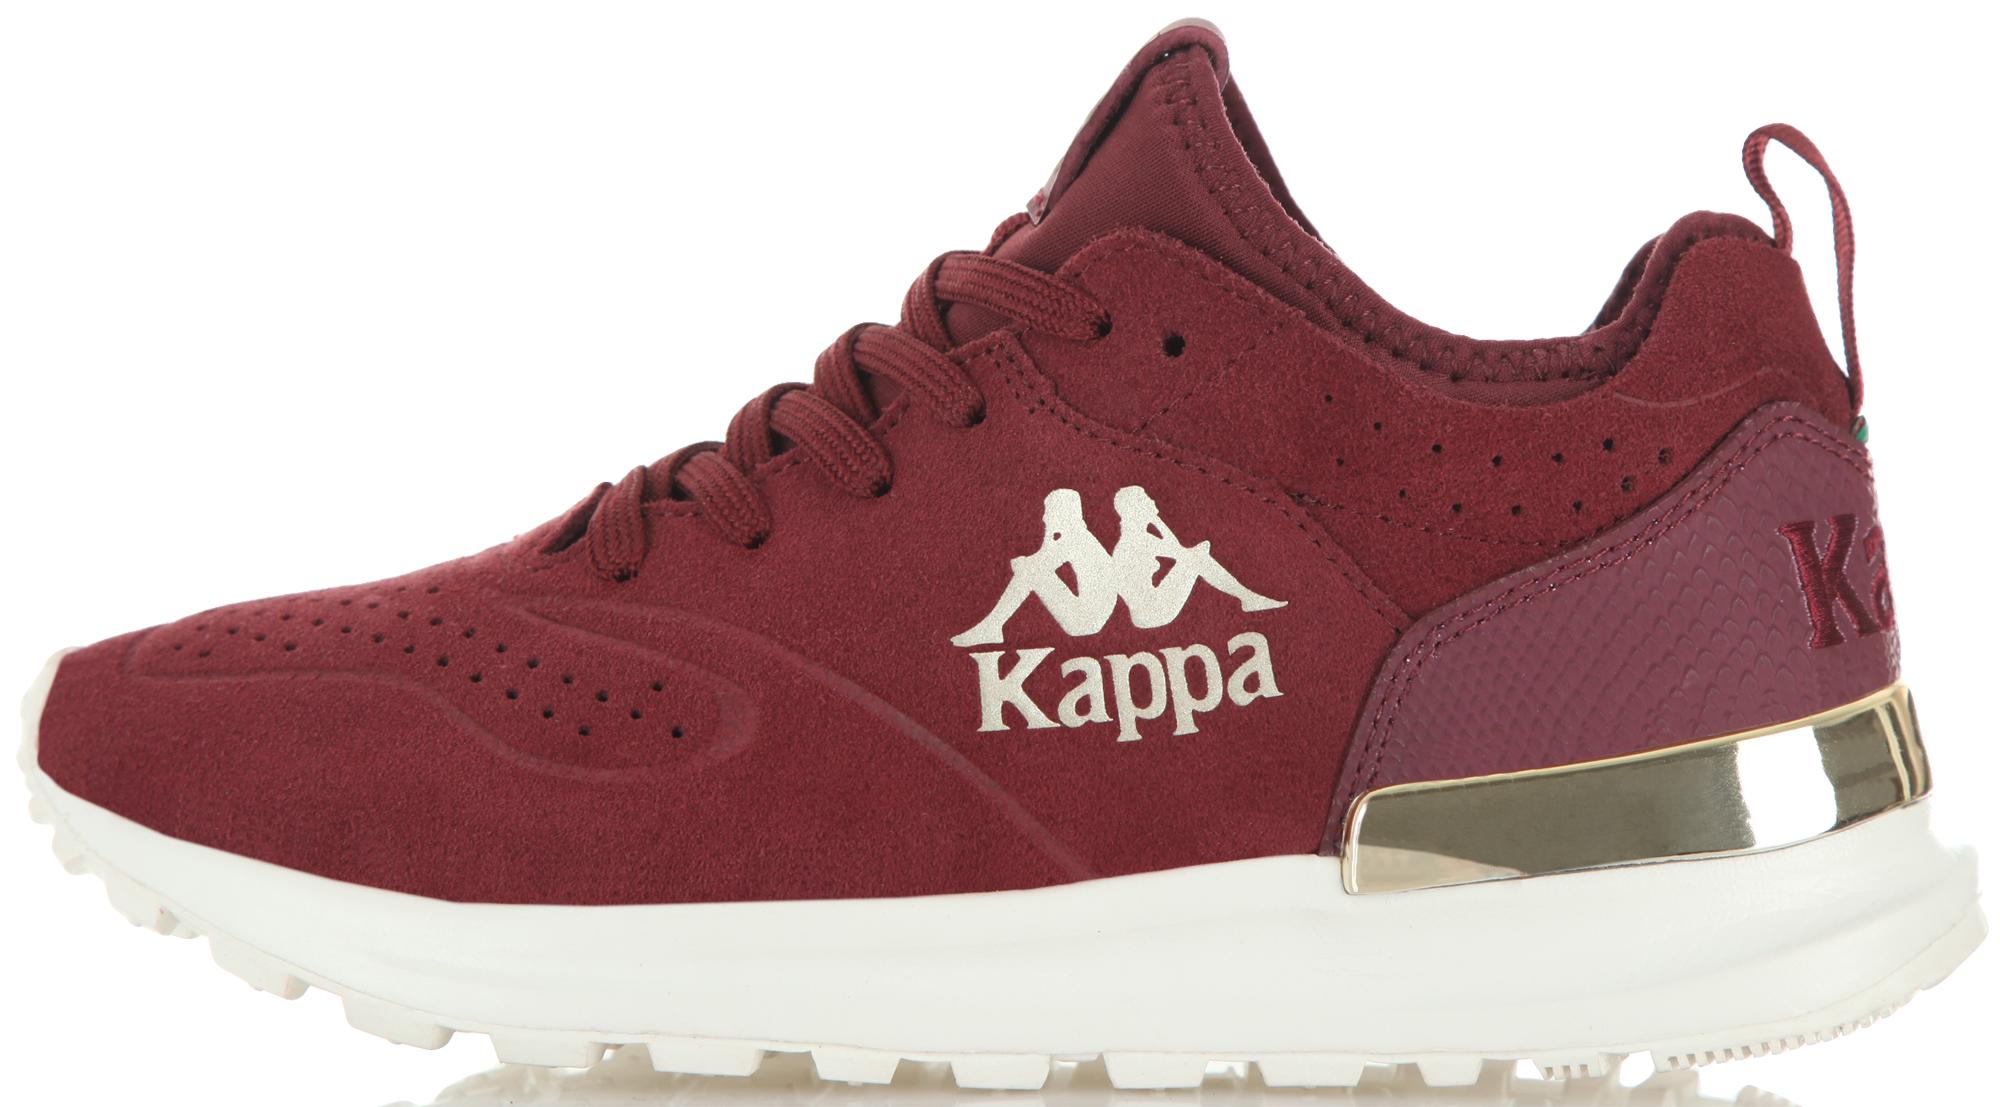 Kappa Кроссовки женские Kappa Neoclassic, размер 40 kappa кроссовки женские kappa linea